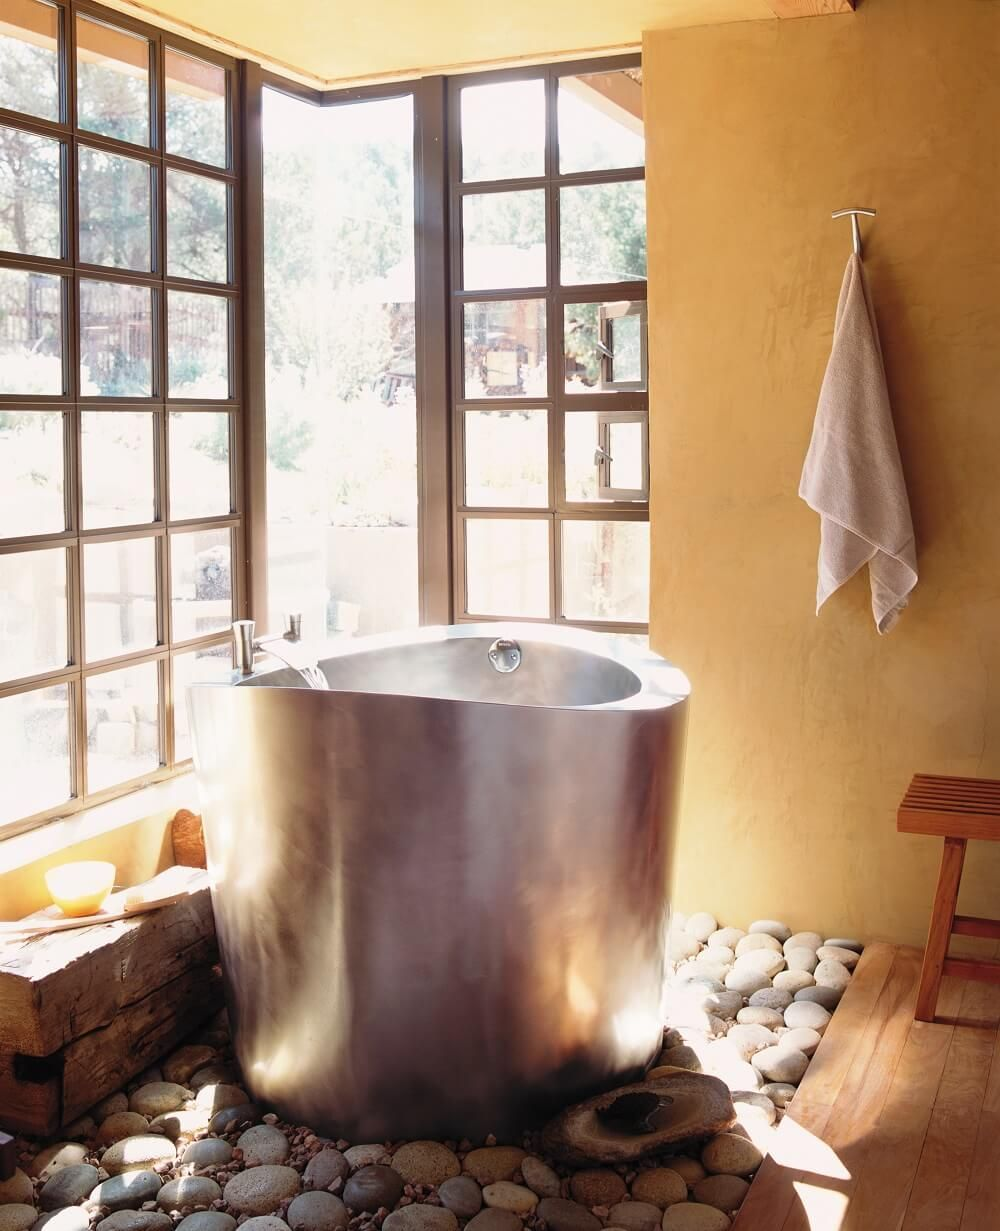 Salle De Bain Japonais ~ stainless steel circular japanese soaking bath 42 round x 35